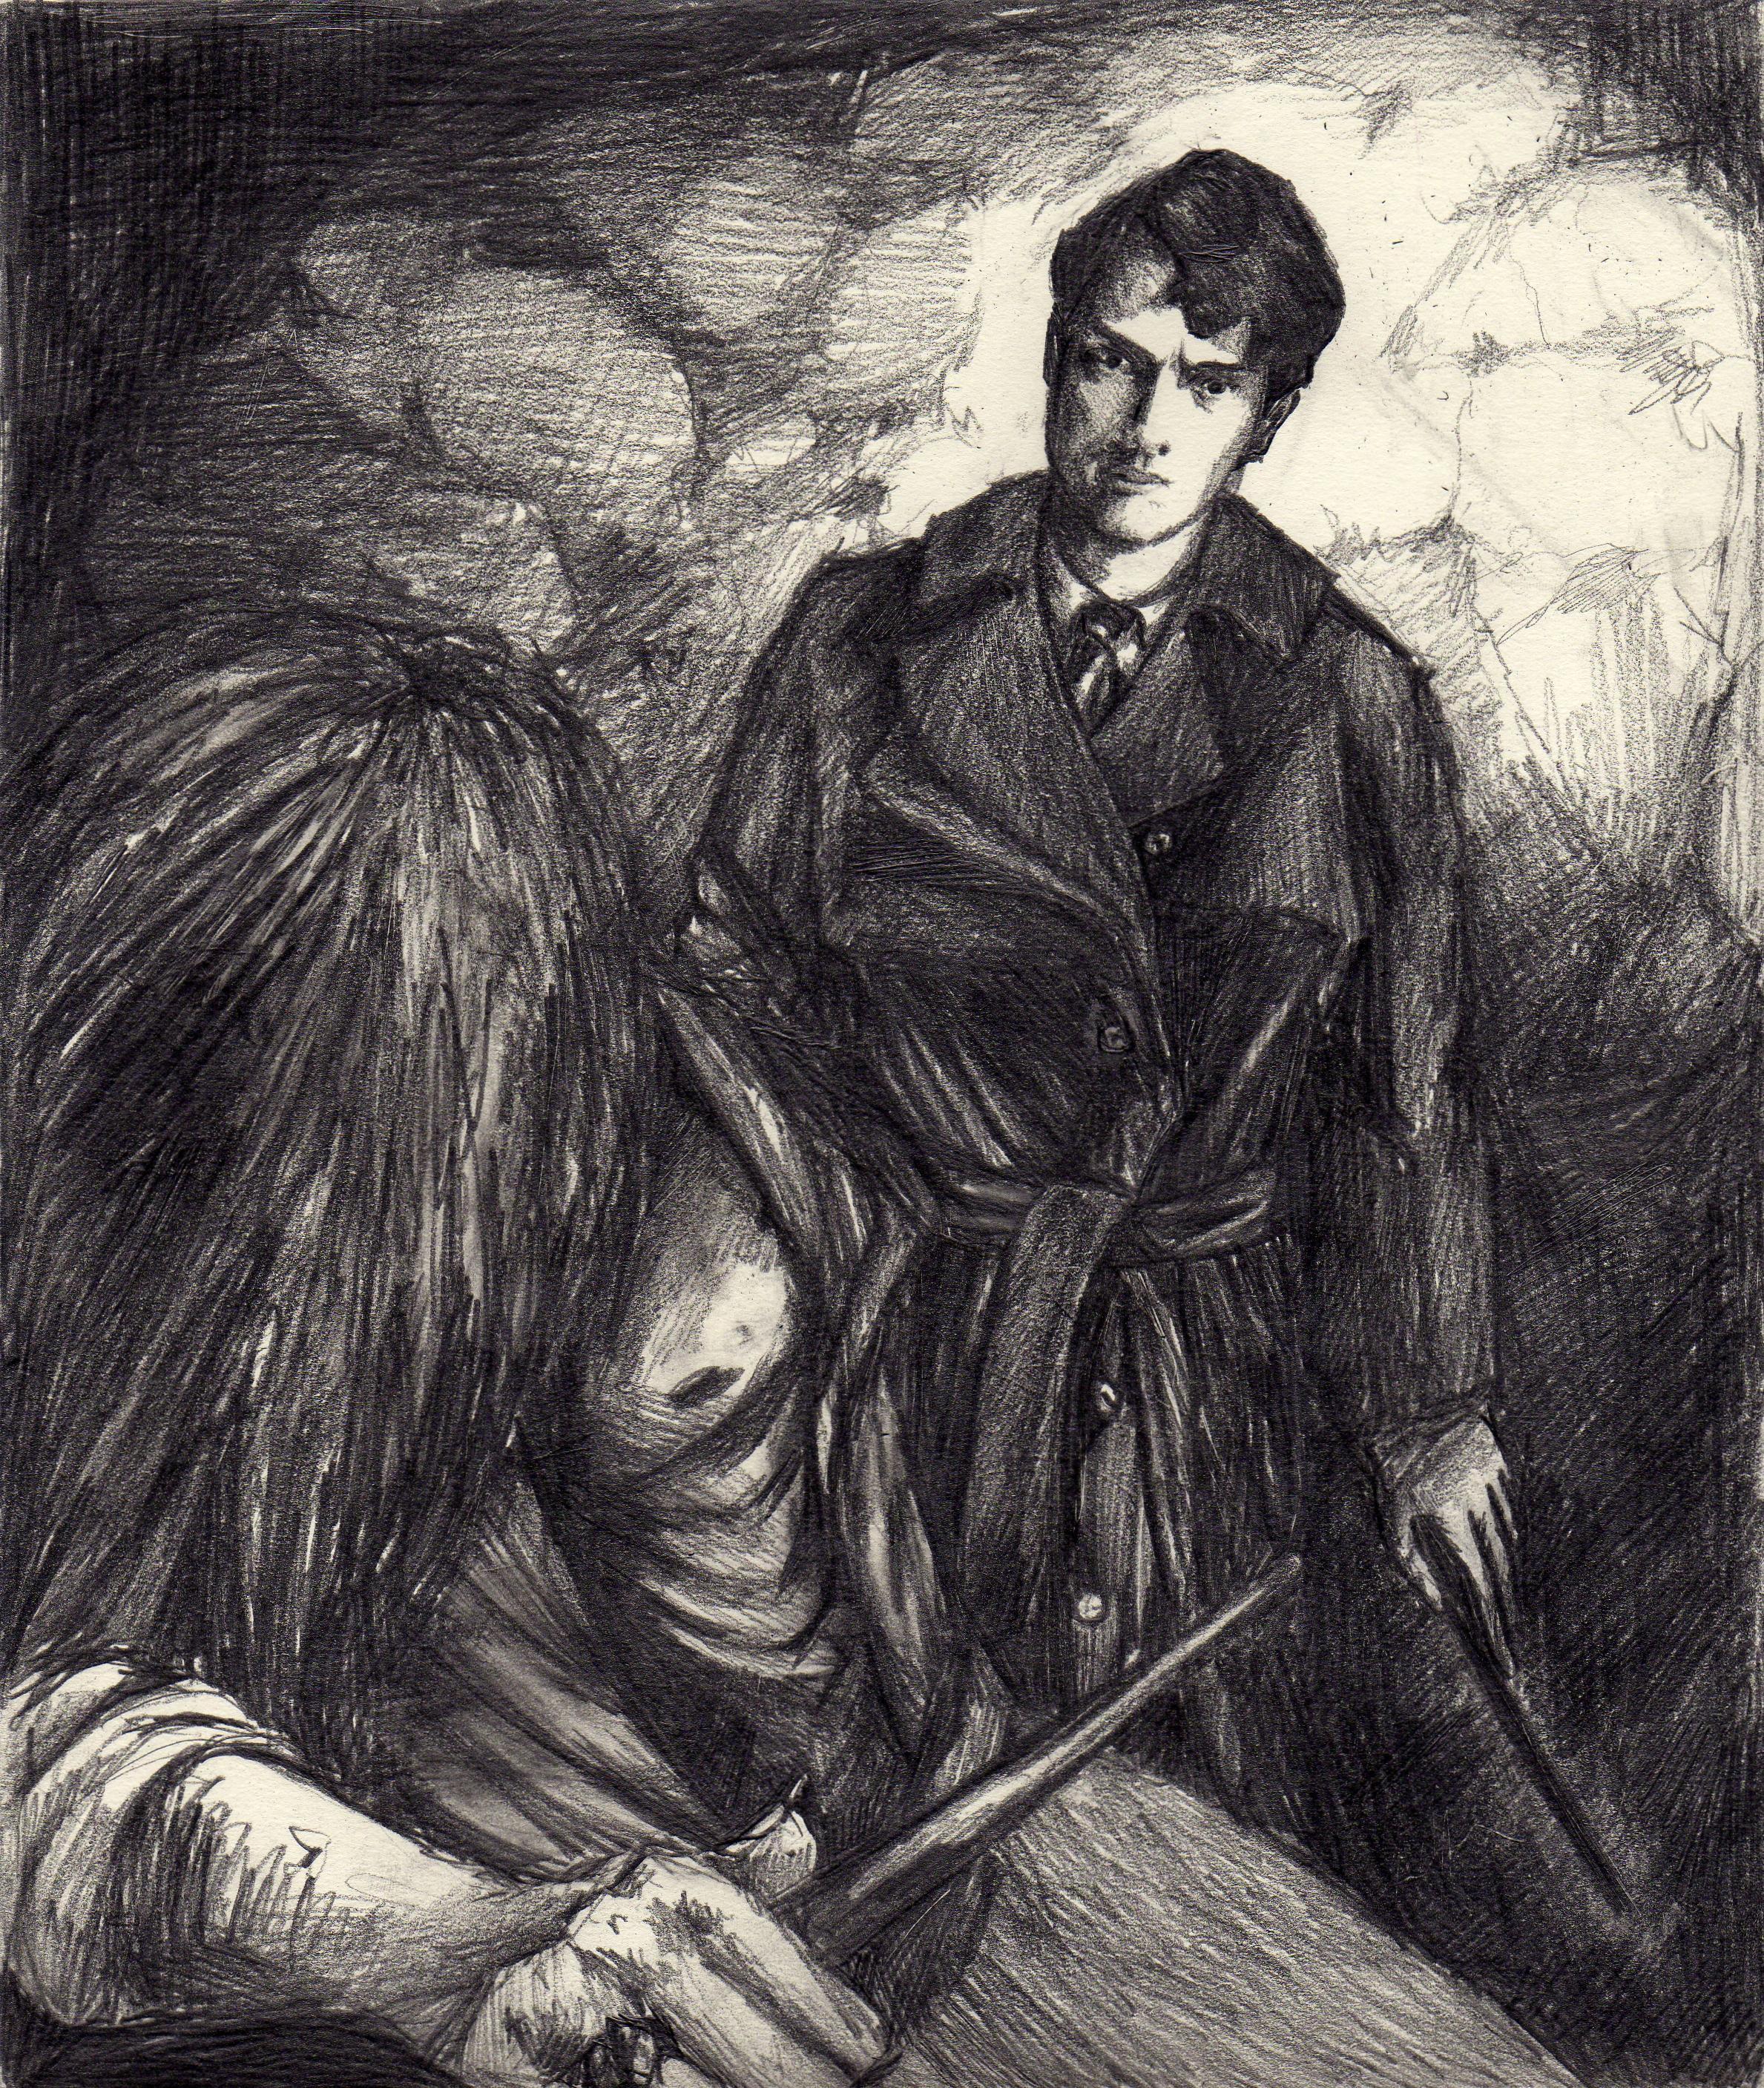 Morfin Gaunt | Harry Potter Wiki | Fandom powered by Wikia